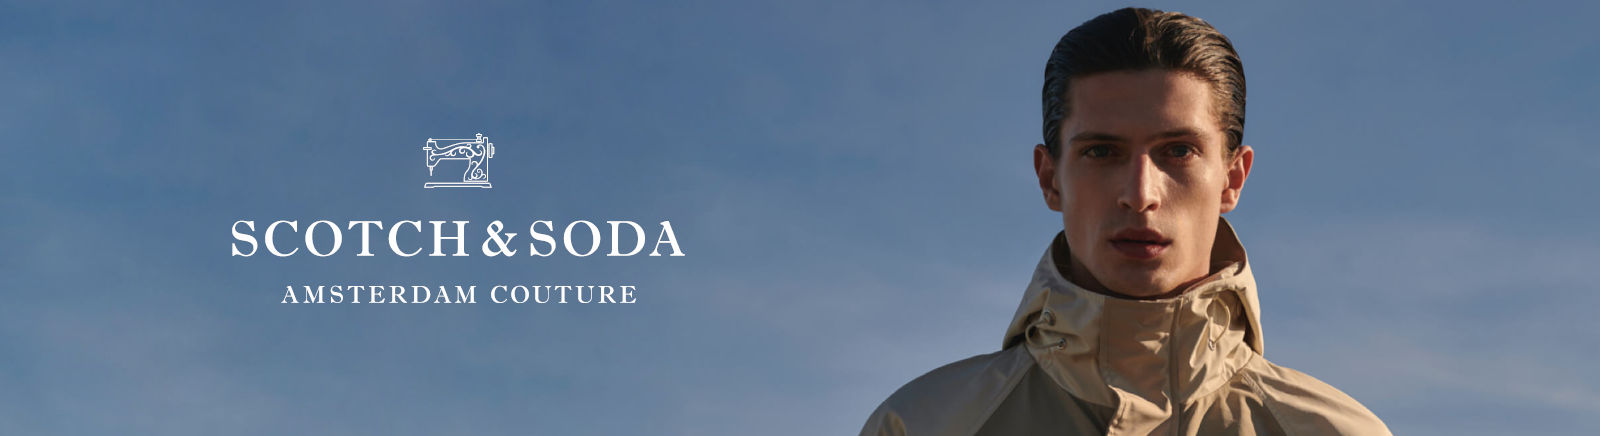 Scotch & Soda Herrenschuhe online kaufen im GISY Schuhe Shop